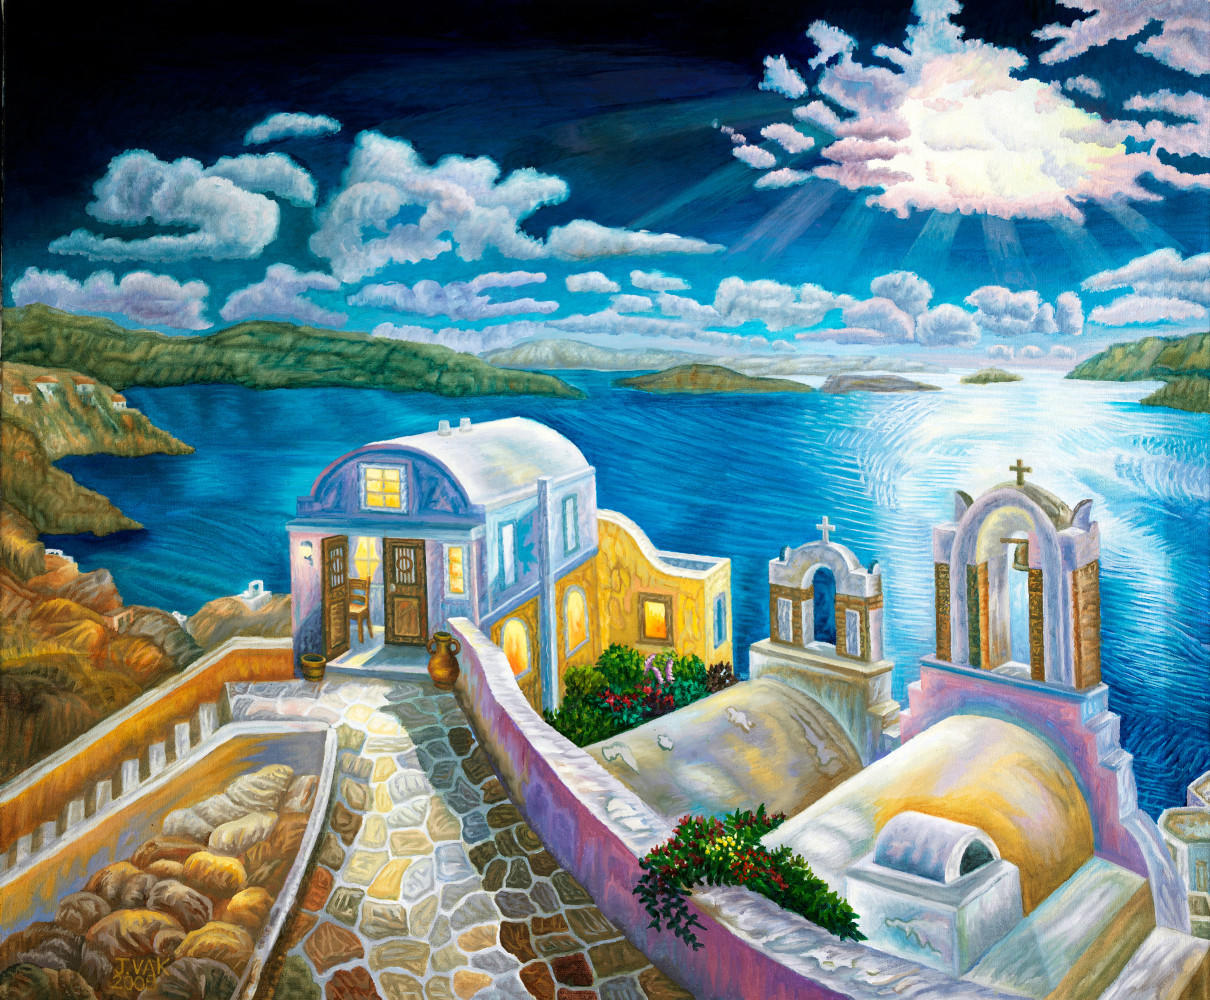 Santorini by Moonlight       30x36 Original         $3850           2008